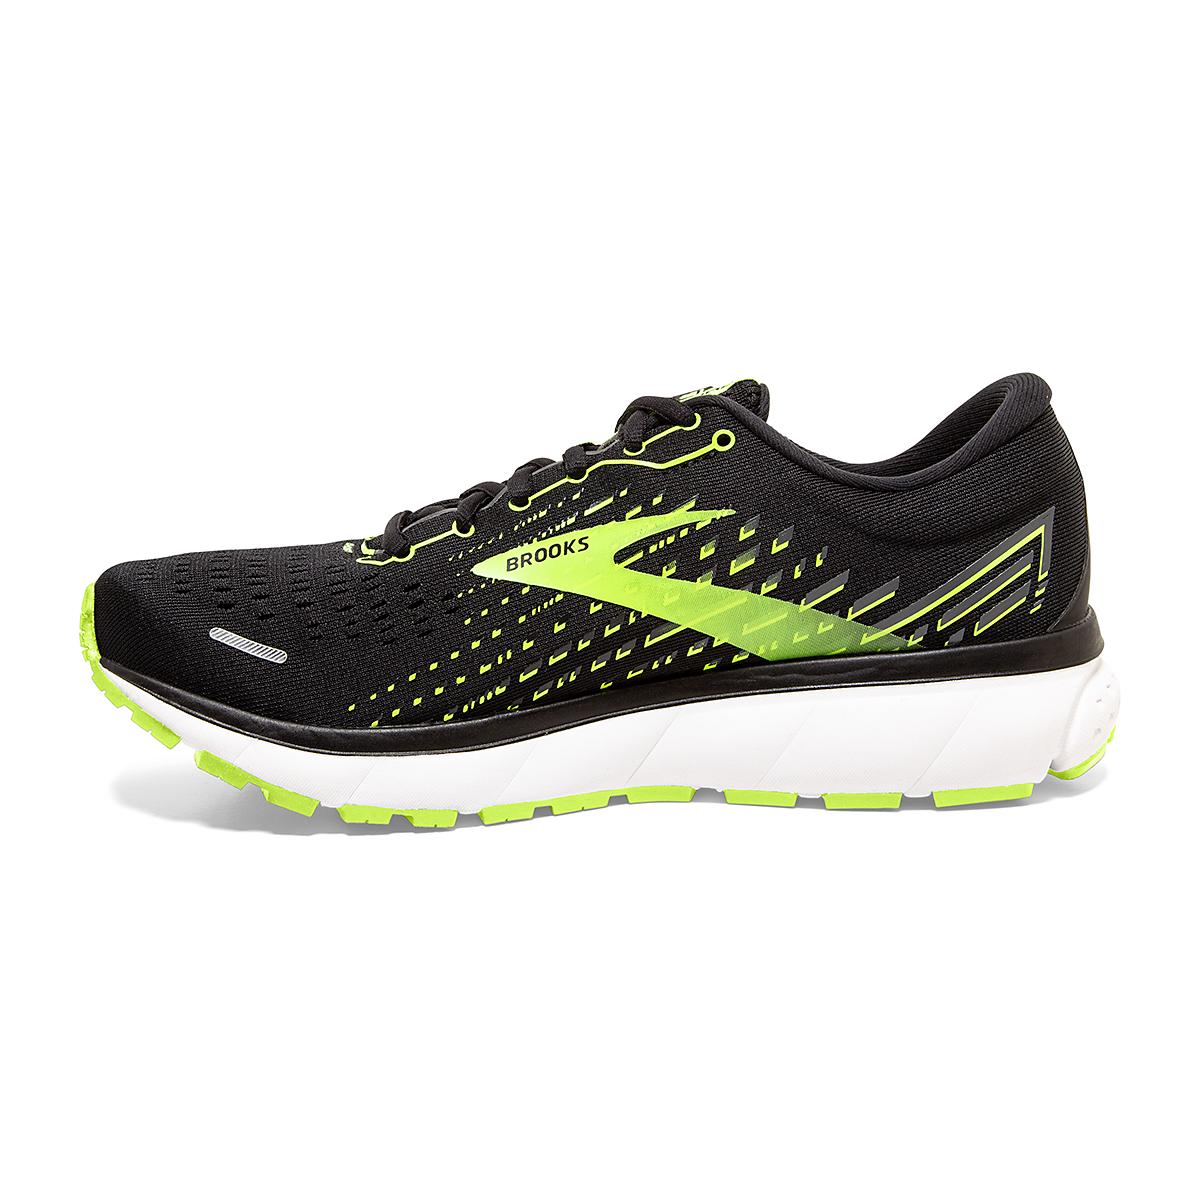 Men's Brooks Ghost 13 Running Shoe - Color: Black/Nightlife/White - Size: 7 - Width: Regular, Black/Nightlife/White, large, image 2